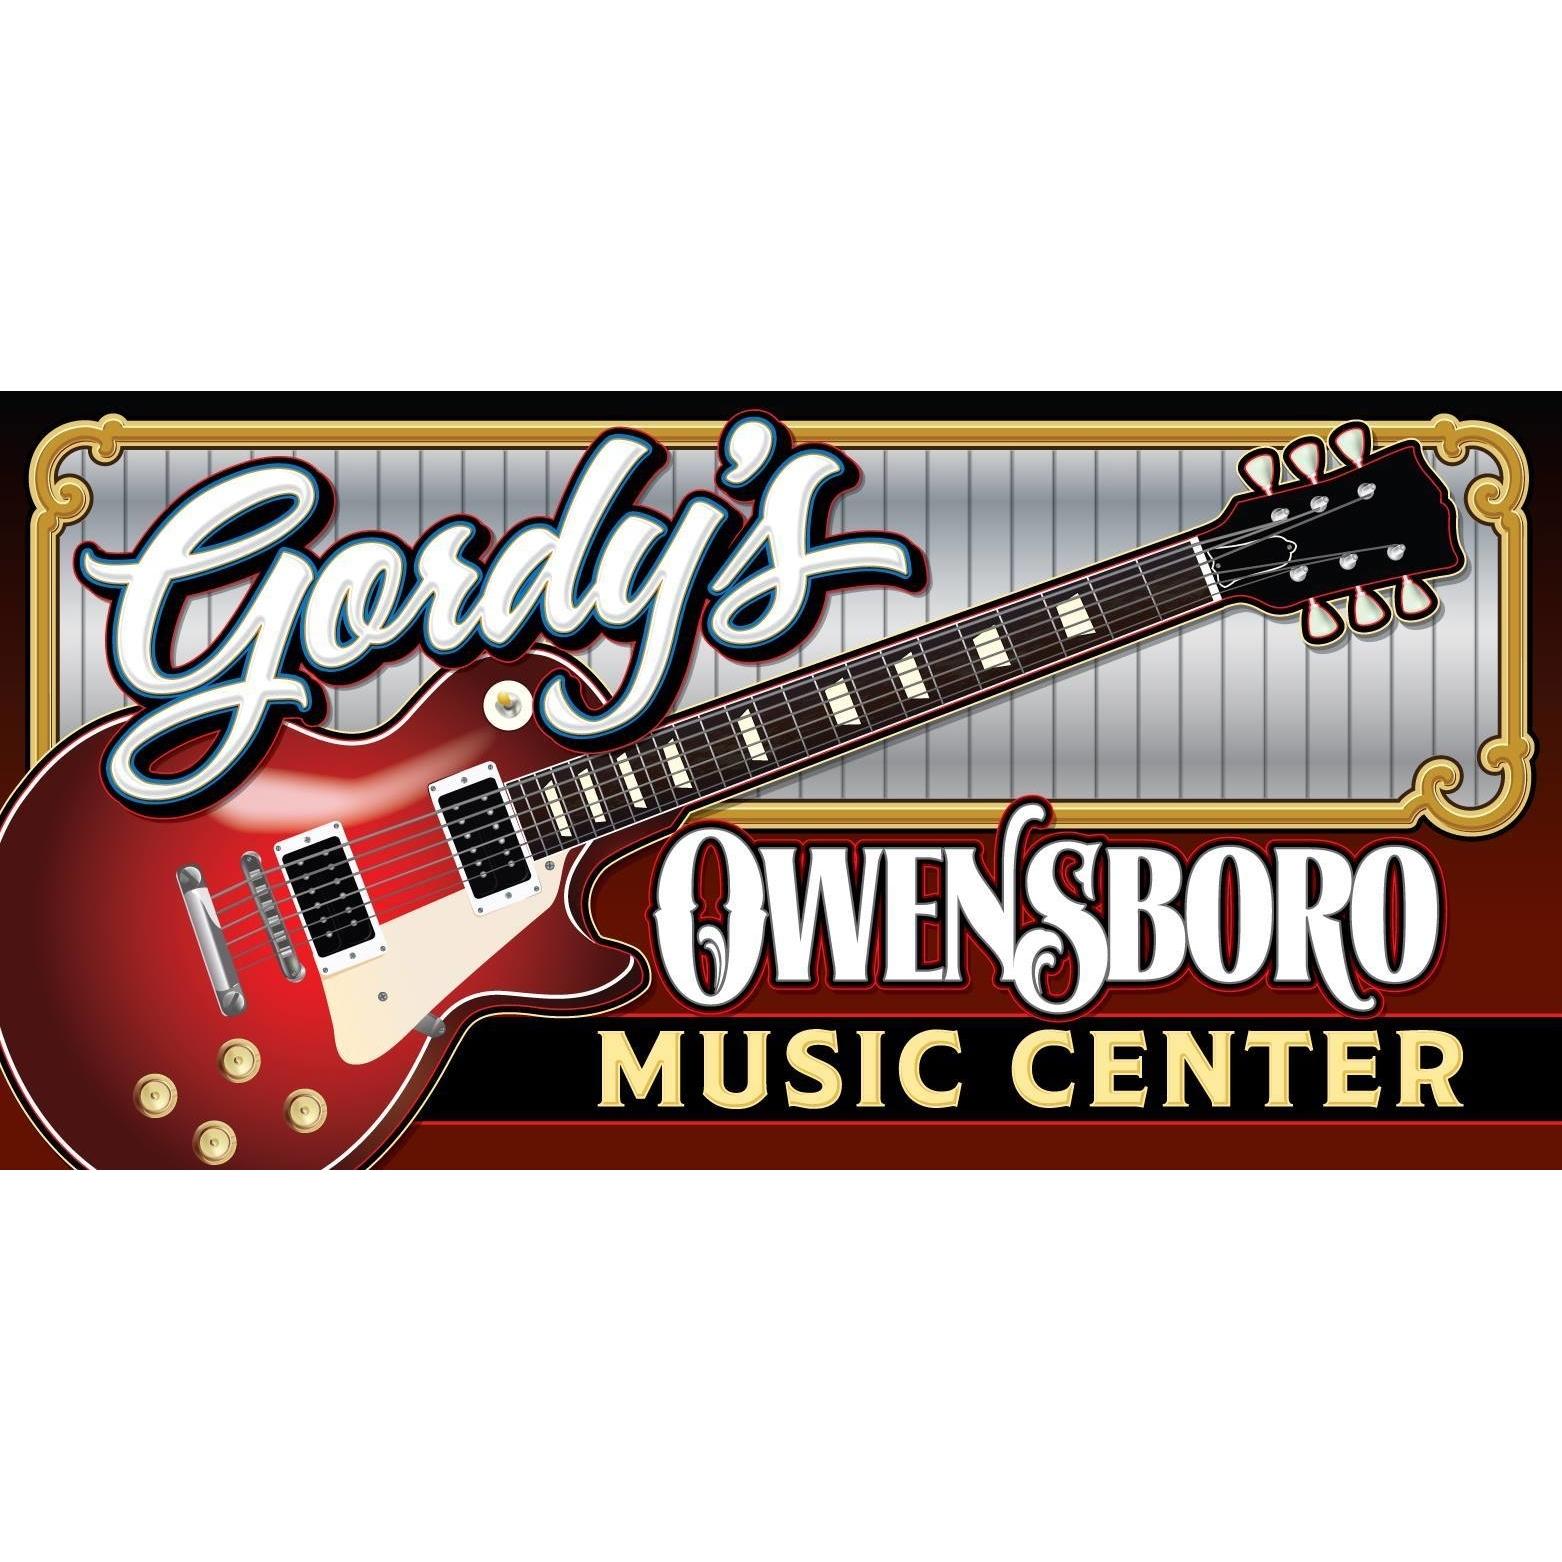 Ownesboro Music Center image 1